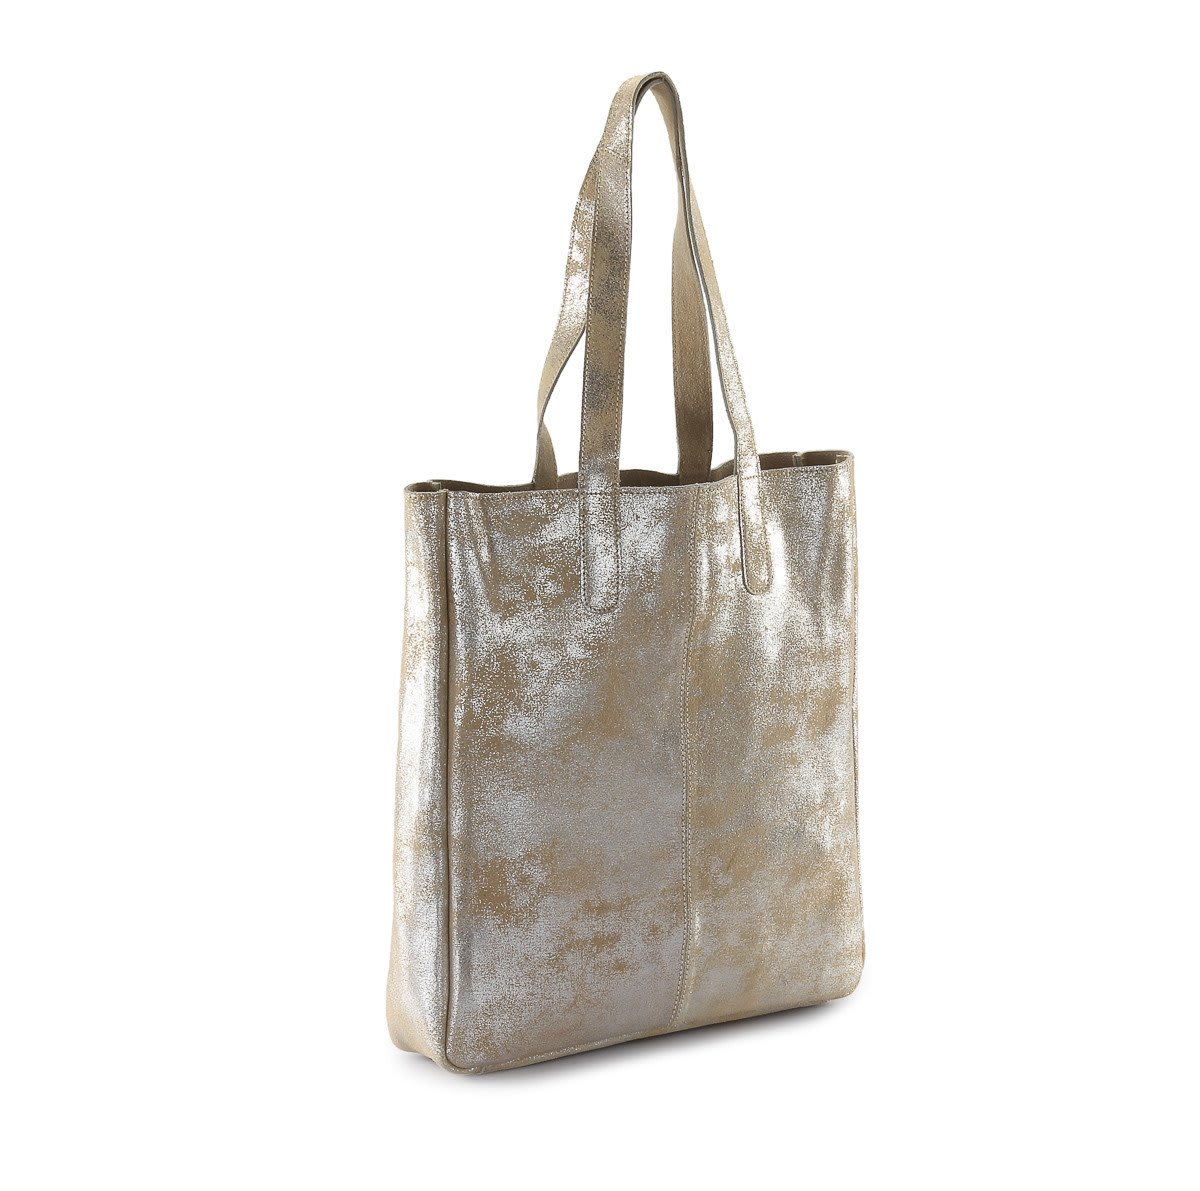 0ab390bde Trouva: Metallic Gold Reversible Tote Bag